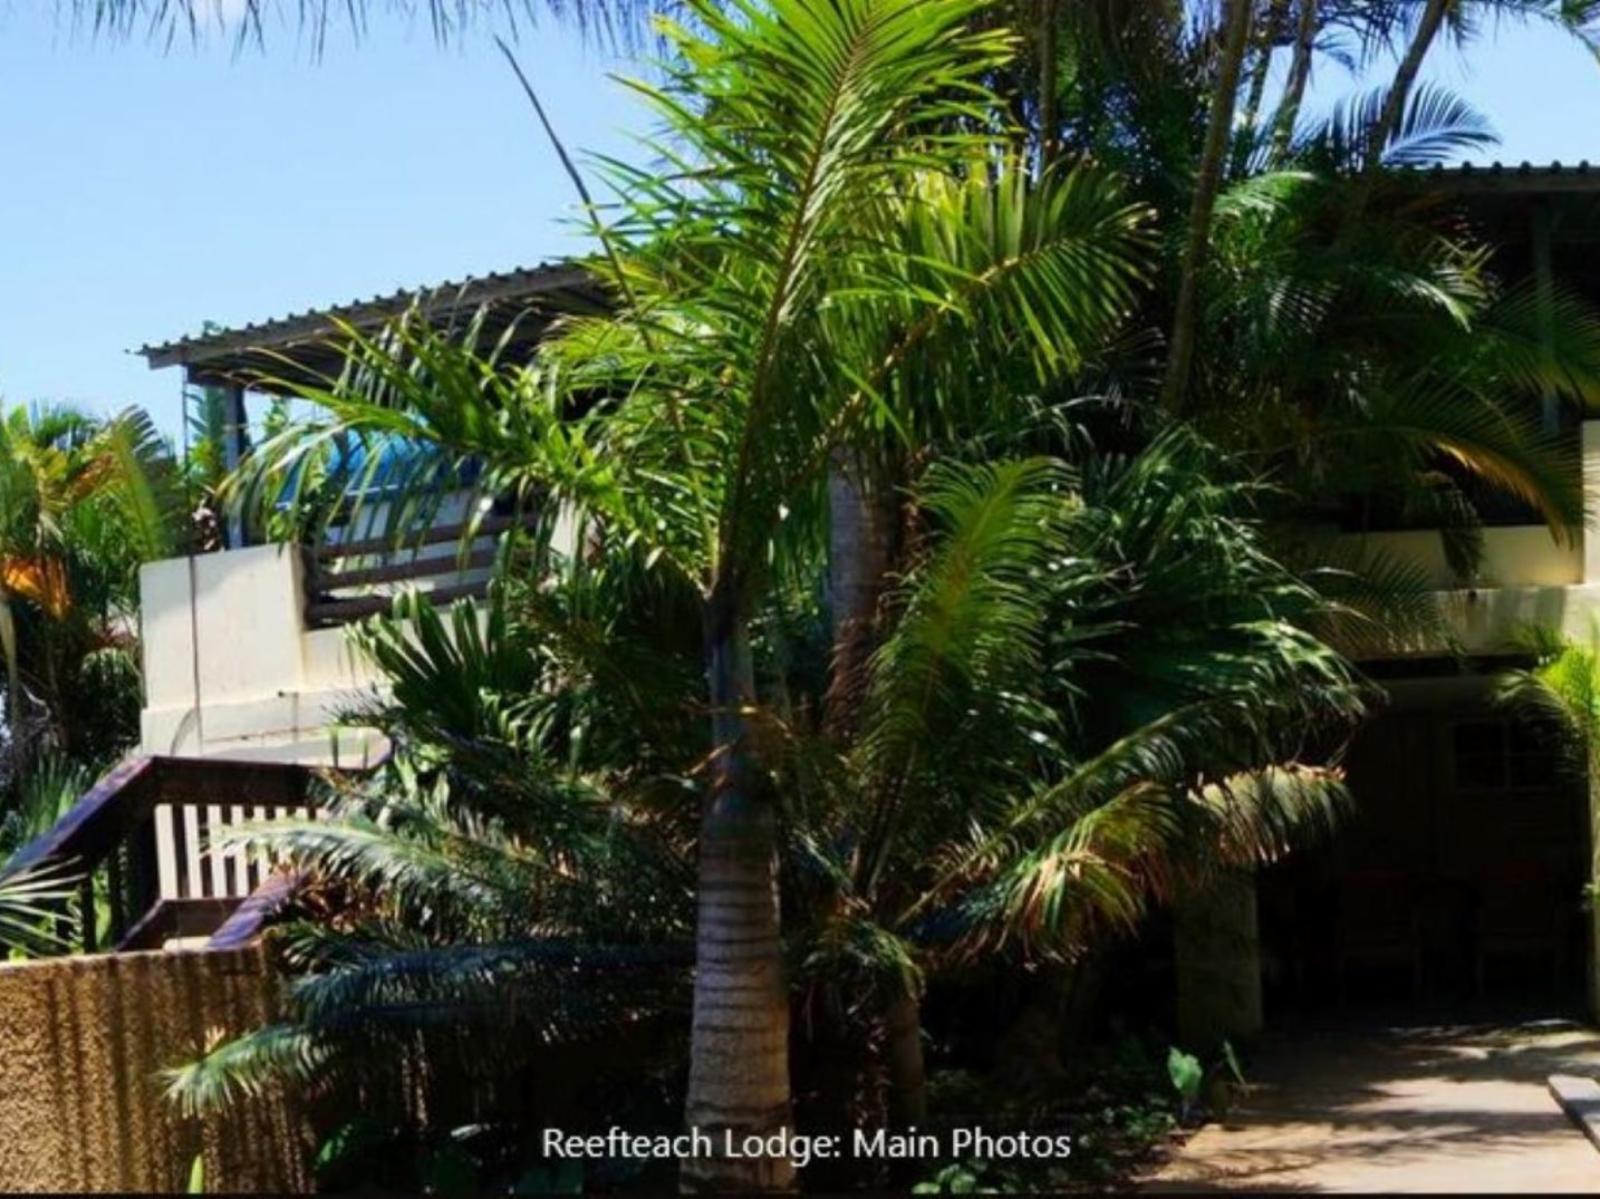 Reefteach Lodge